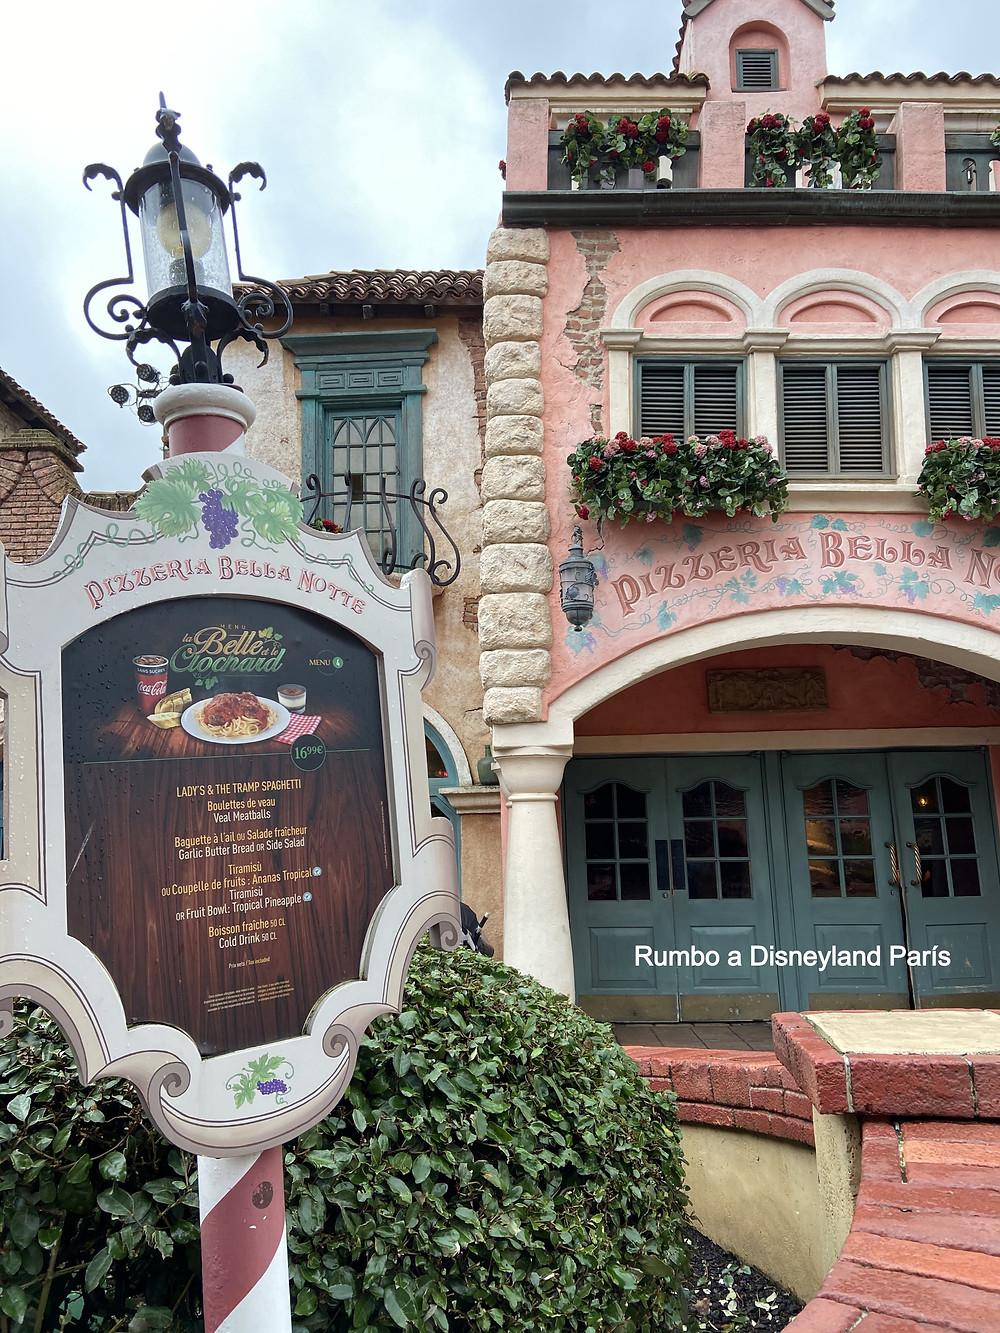 Pizzeria Bella Notte en Disneyland Paris